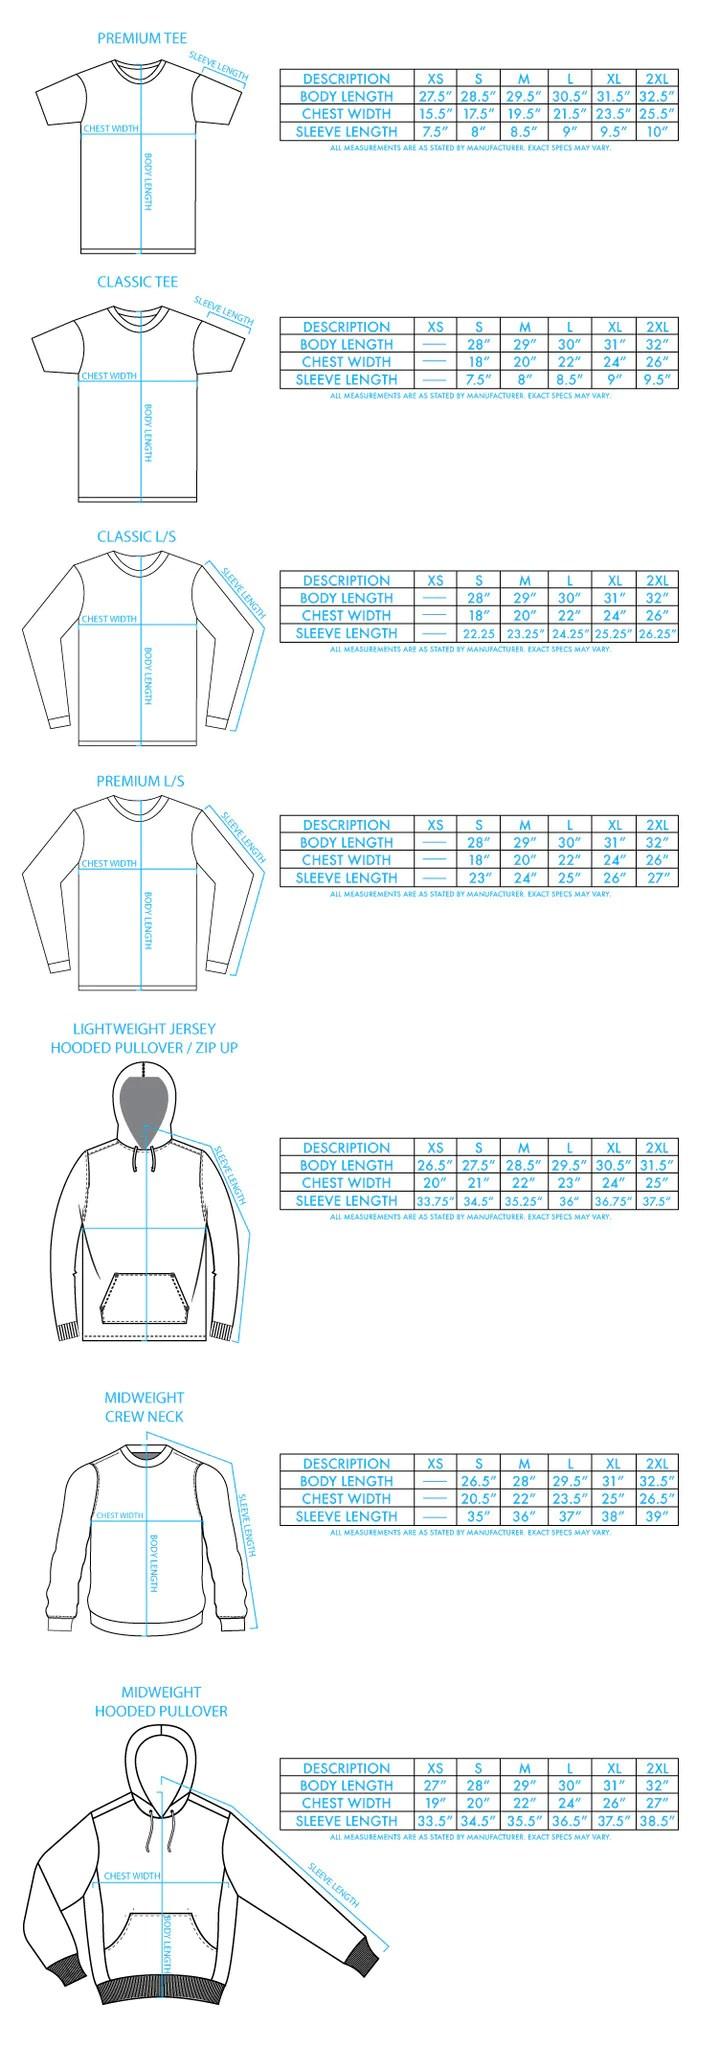 also apparel size chart primitive skateboarding rh primitiveskate